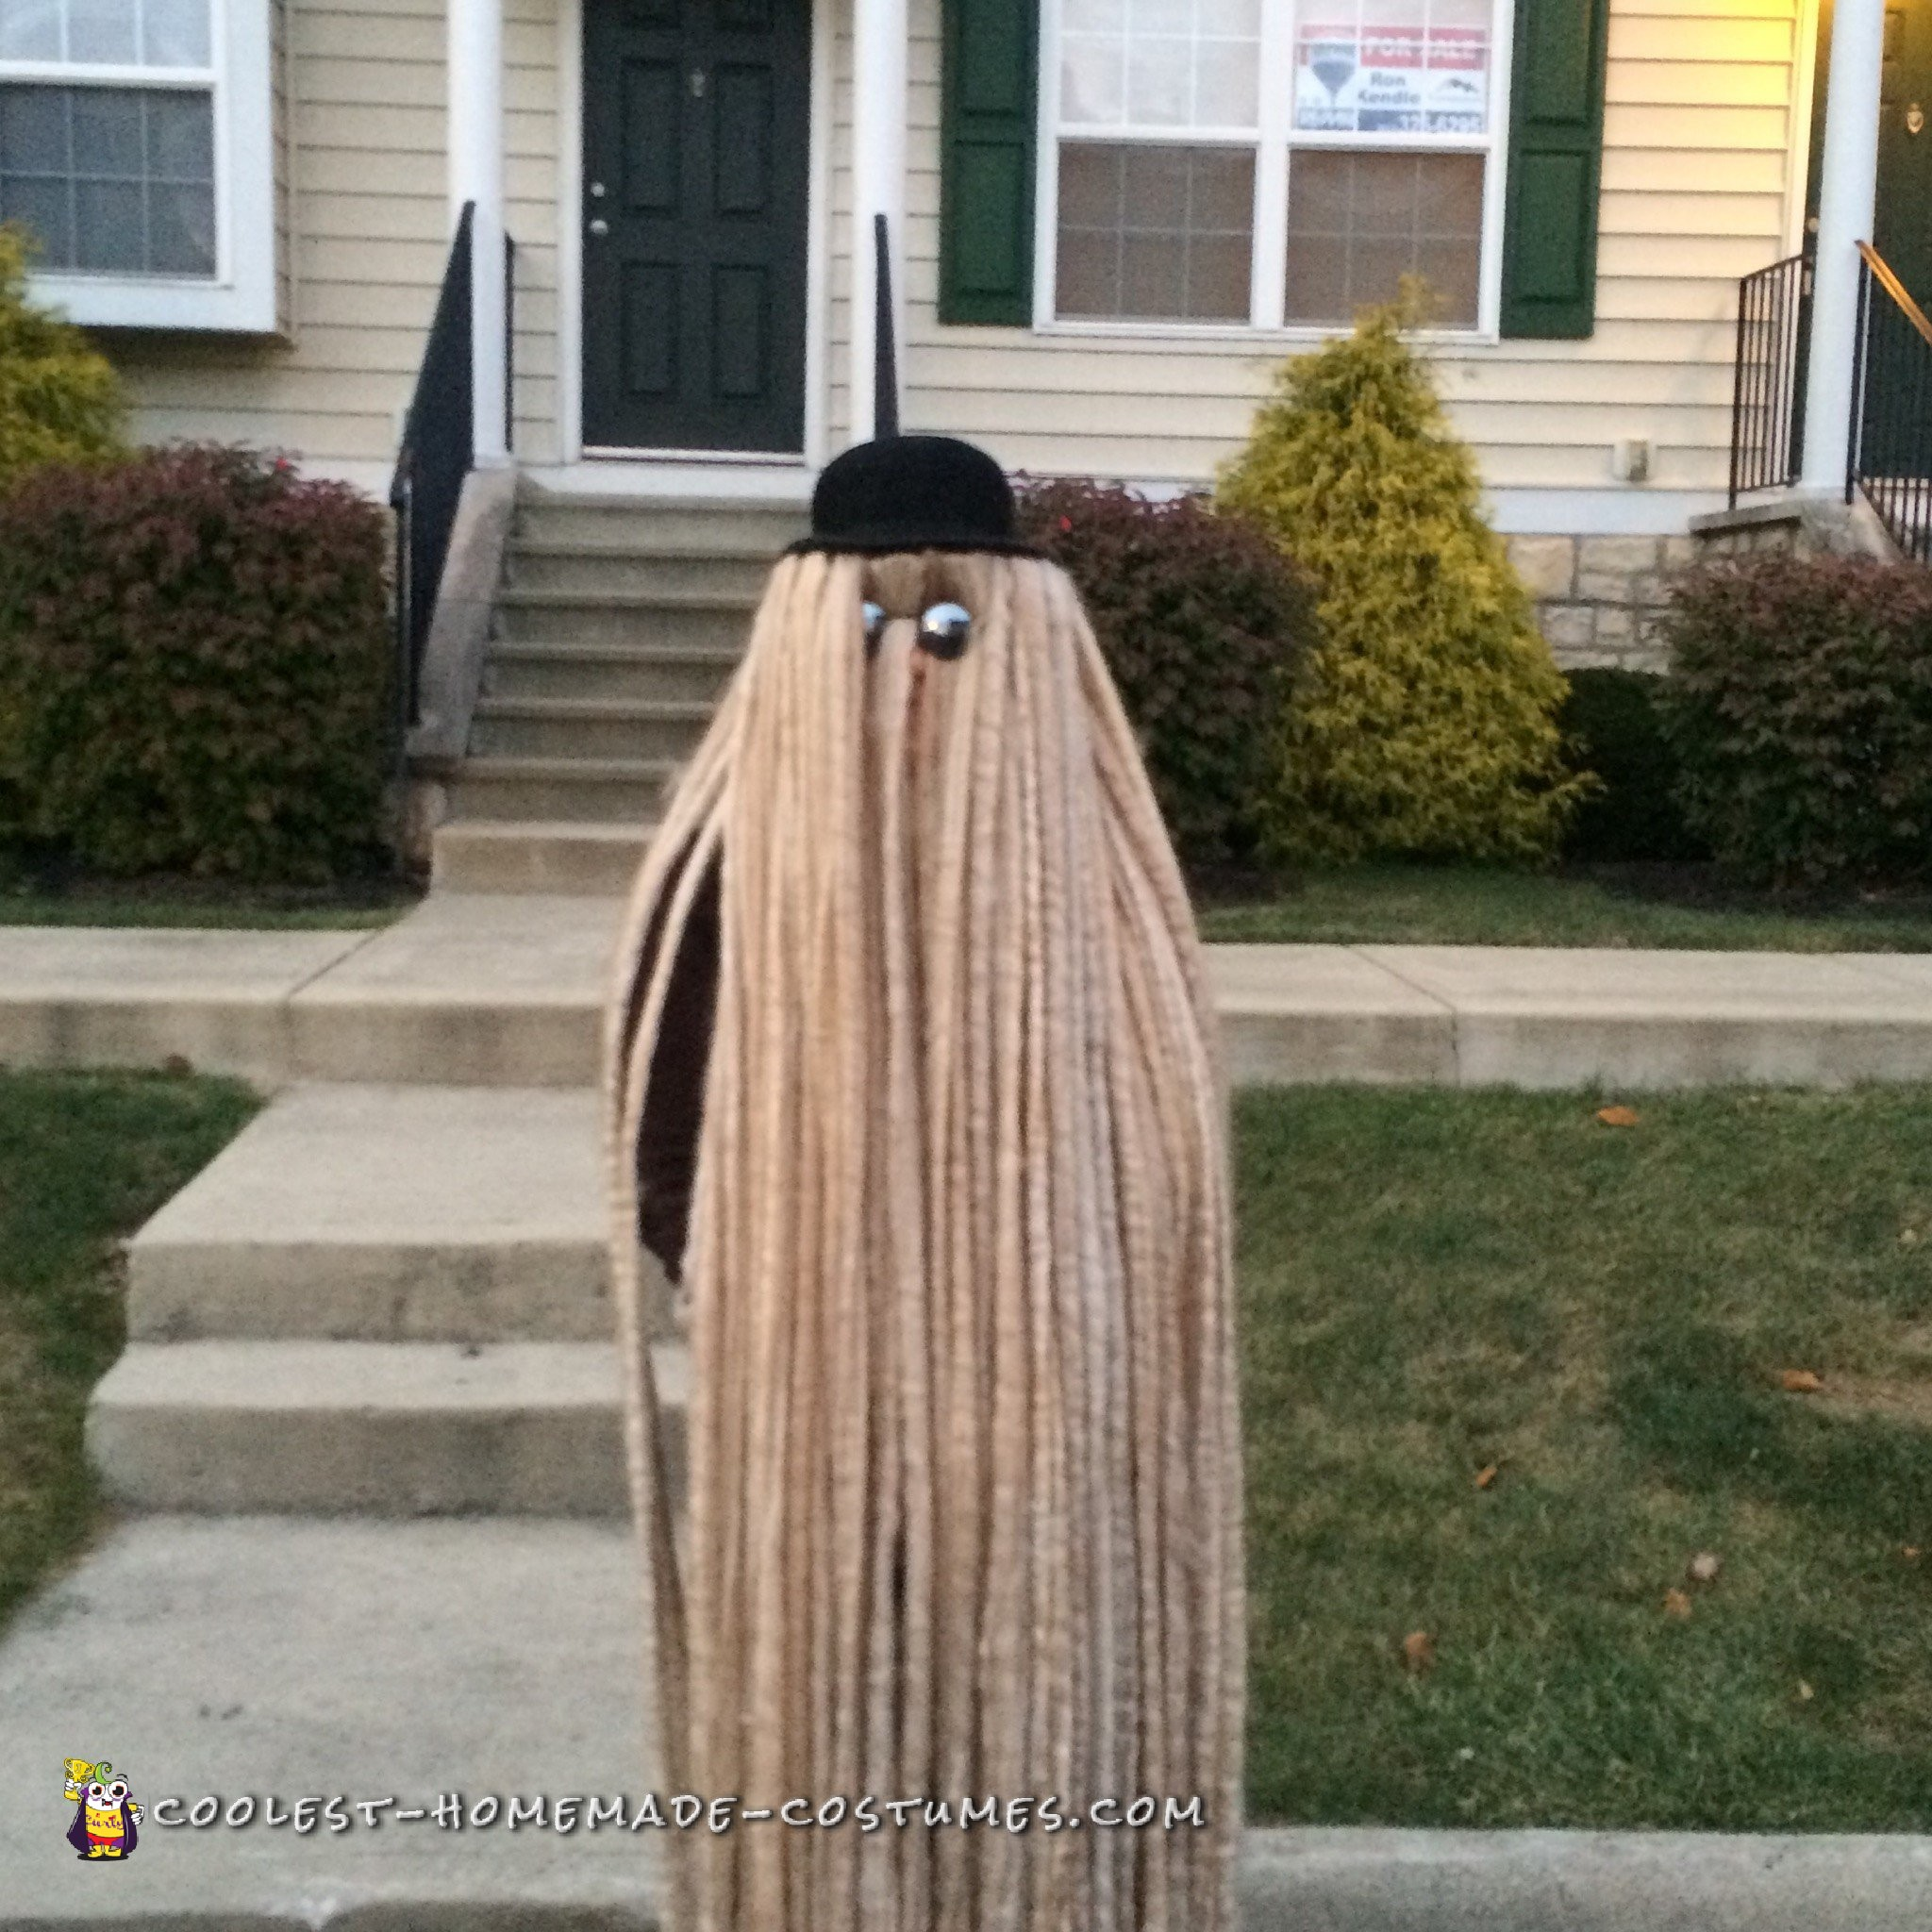 Cool Cousin Itt Costume